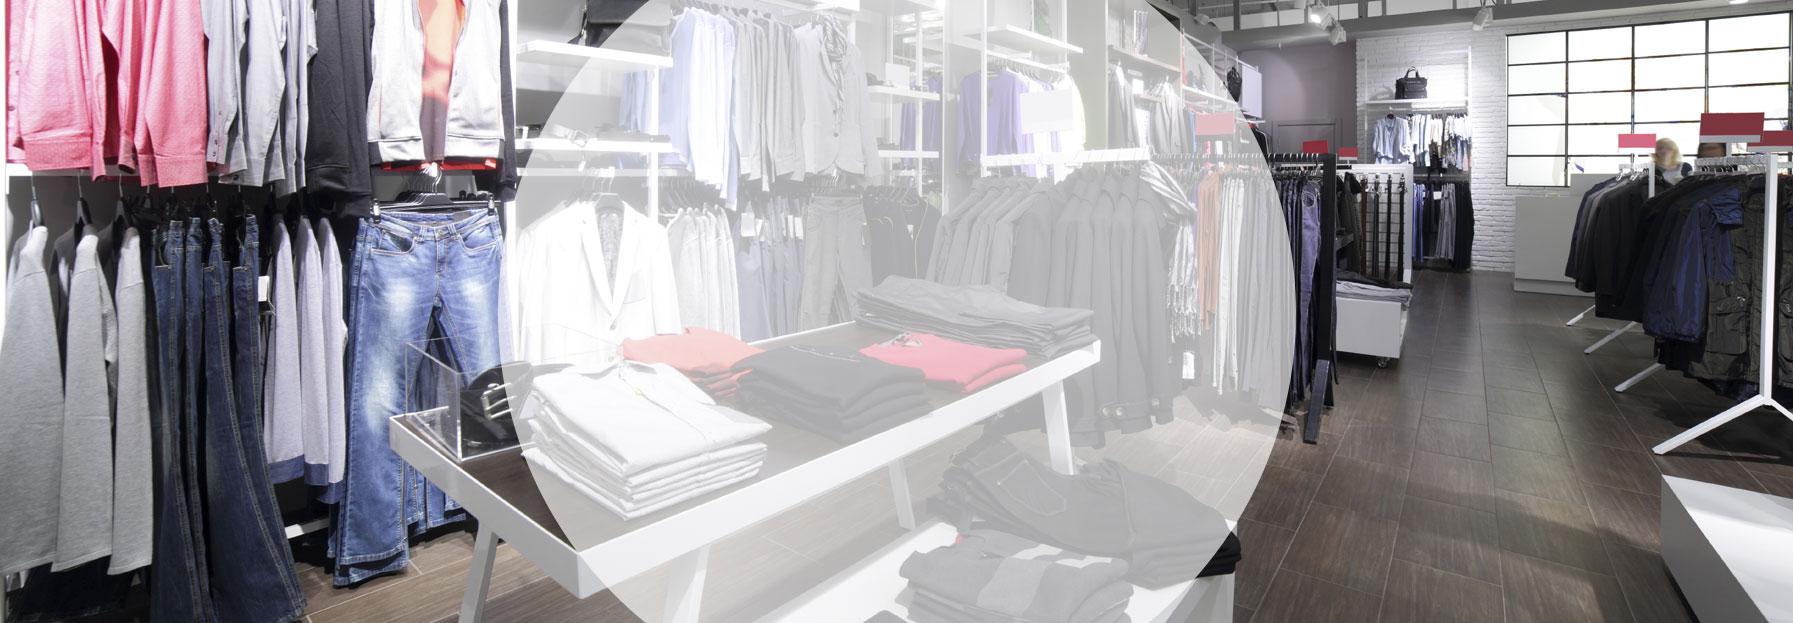 Retail Cleaning Jani King